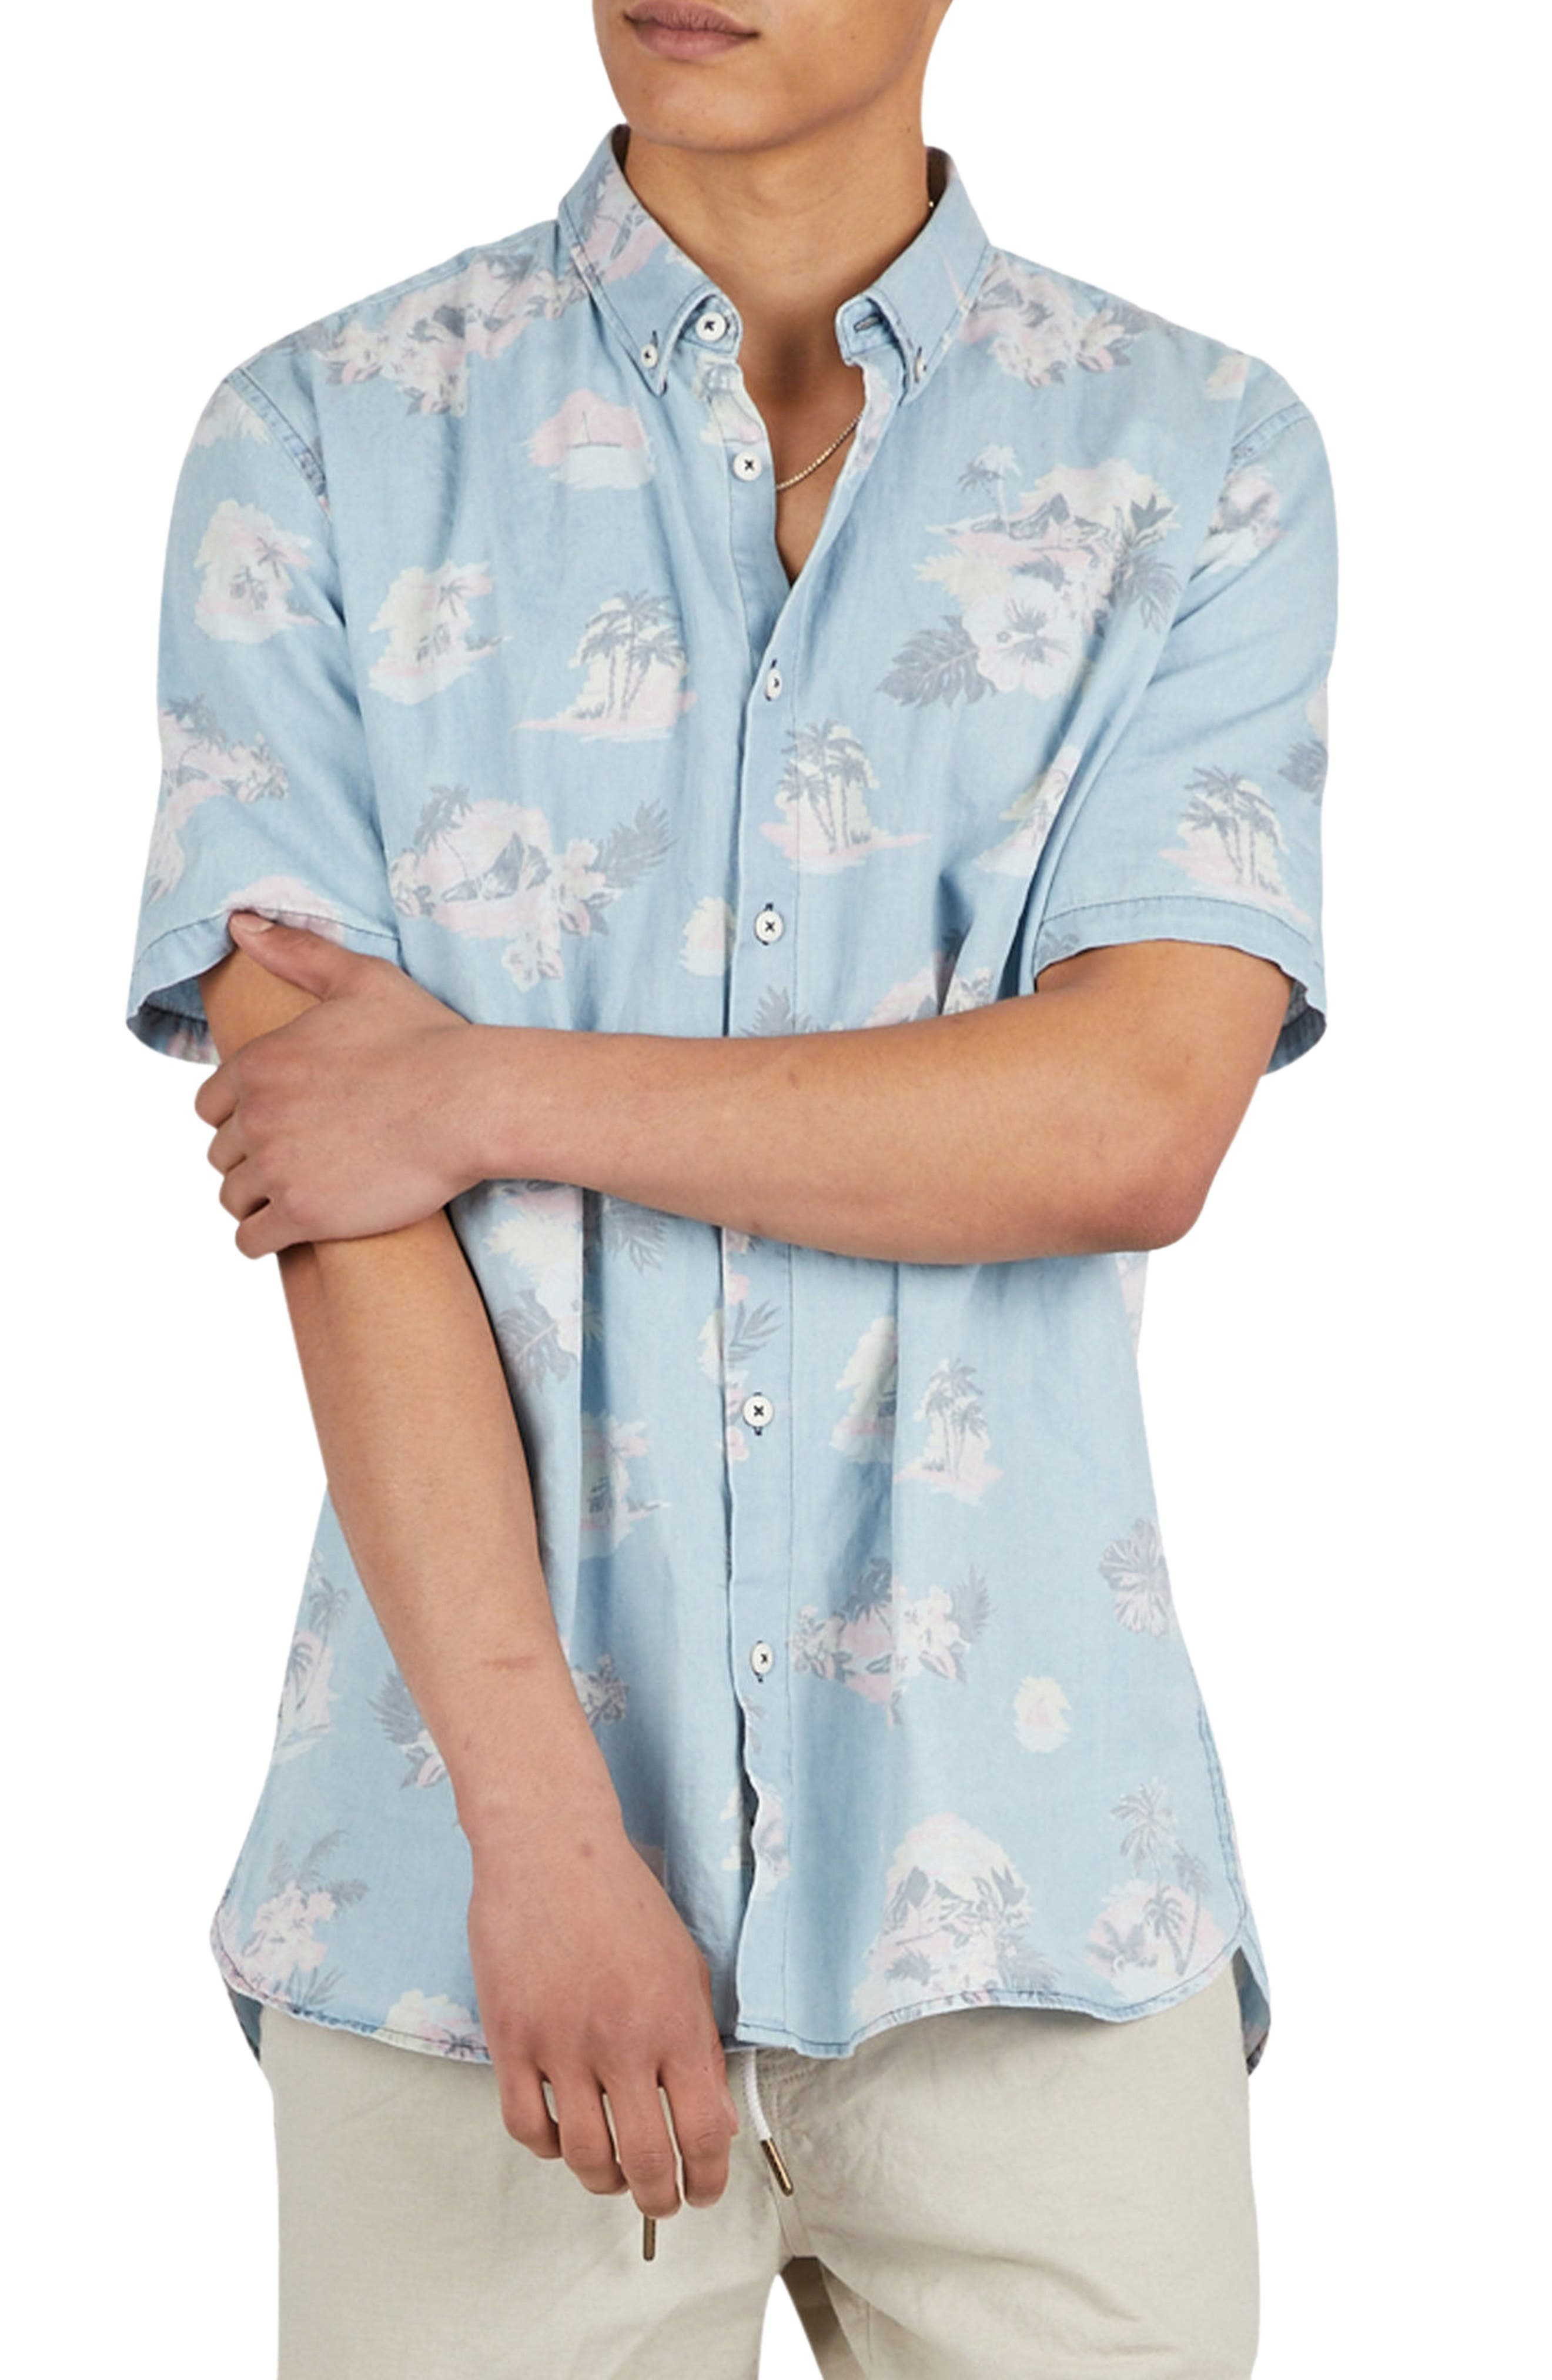 Tropical Print Woven Shirt,                             Alternate thumbnail 5, color,                             Indigo/ Floral